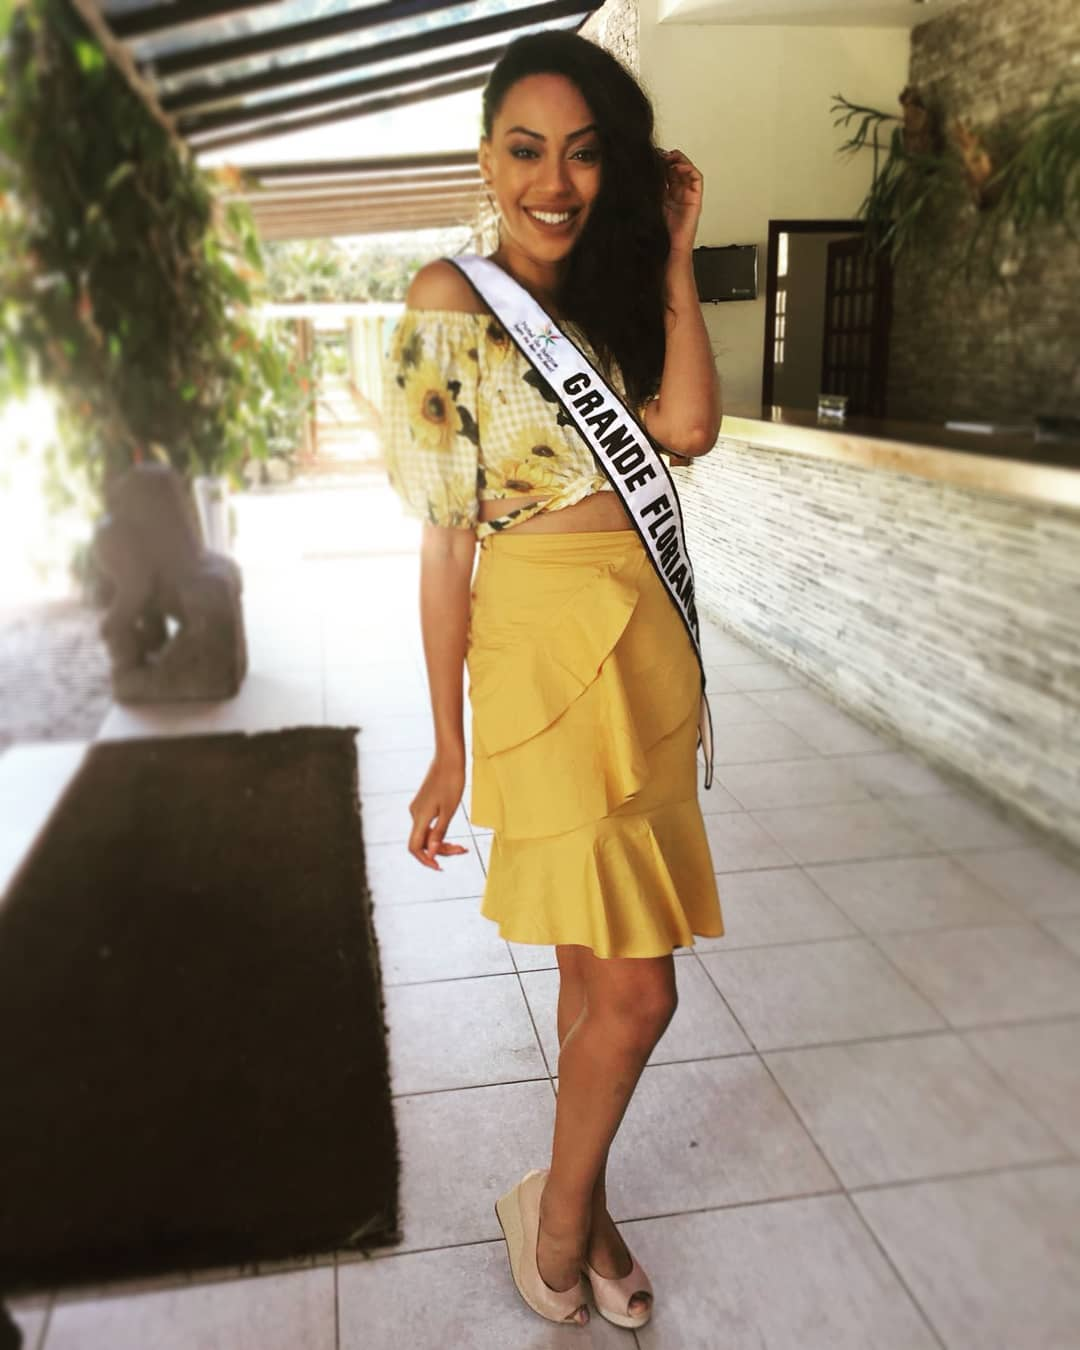 helena maier, miss grande florianopolis mundo 2018. - Página 3 38051810